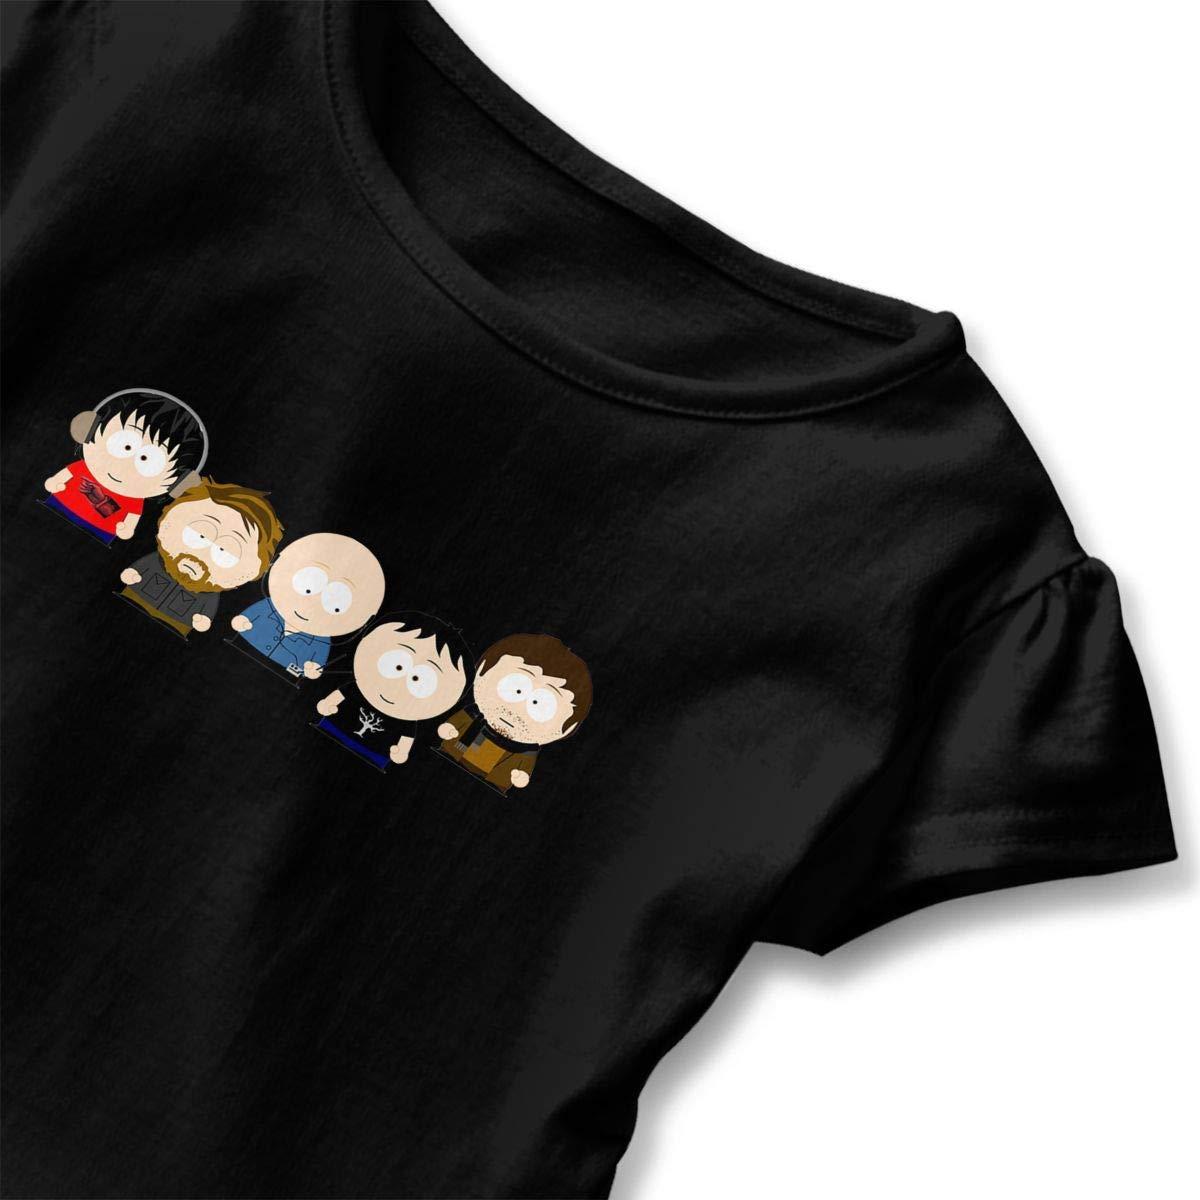 Kid T Shirt Hot Radiohead and South Park 3D Tee Baseball Ruffle Short Sleeve Cotton Shirts Top for Girls Kids